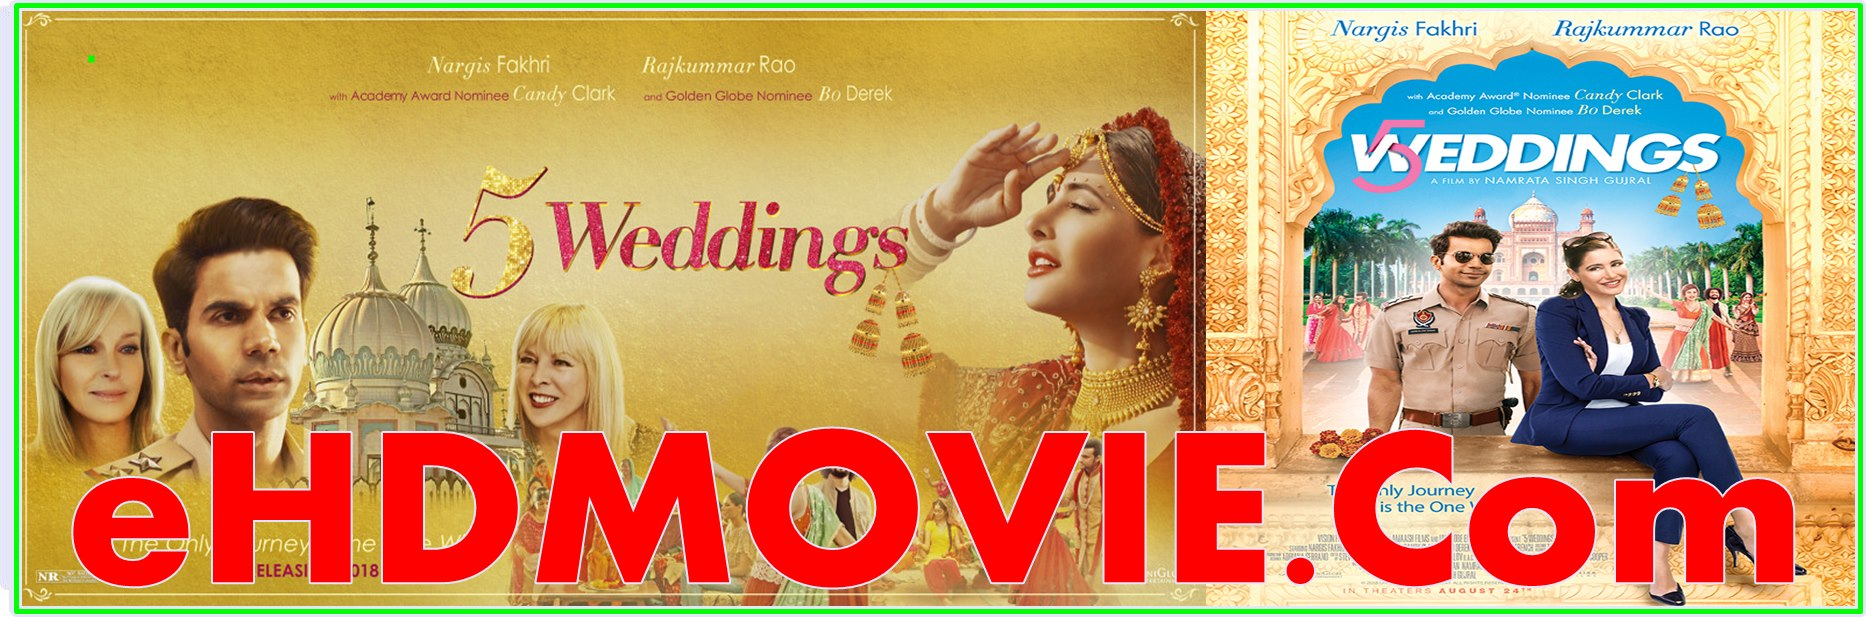 5 Weddings 2018 Full Movie Hindi 1080p - 720p - HEVC - 480p ORG WEB-DL 350MB - 400MB - 1.4GB - 2.5GB ESubs Free Download